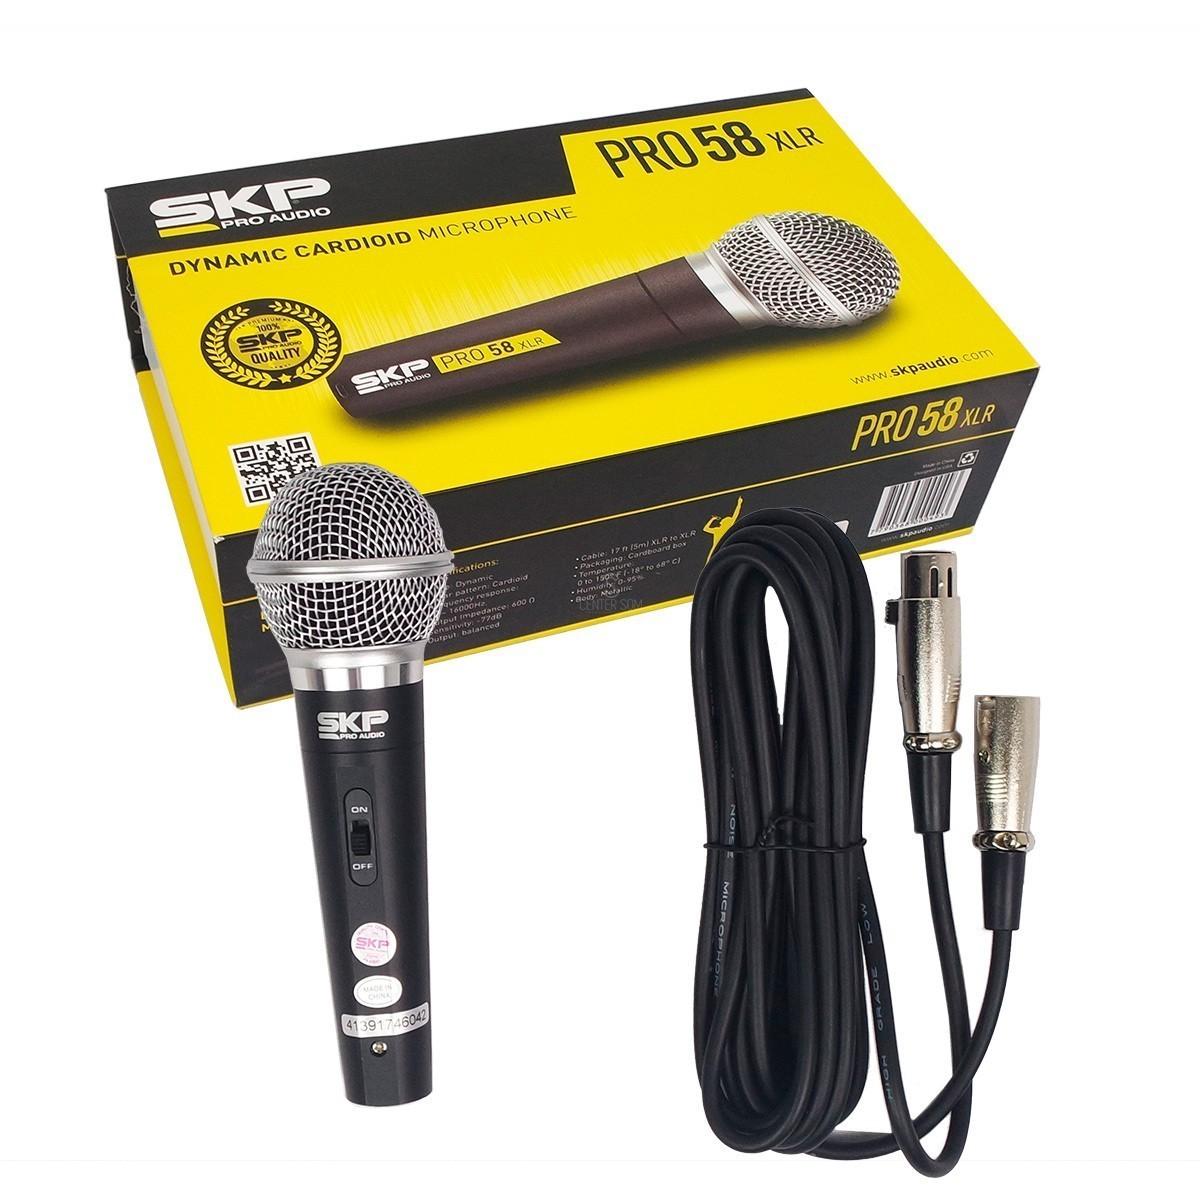 Microfone Pro58xlr SKP Cardióide Dinâmico - Com fio